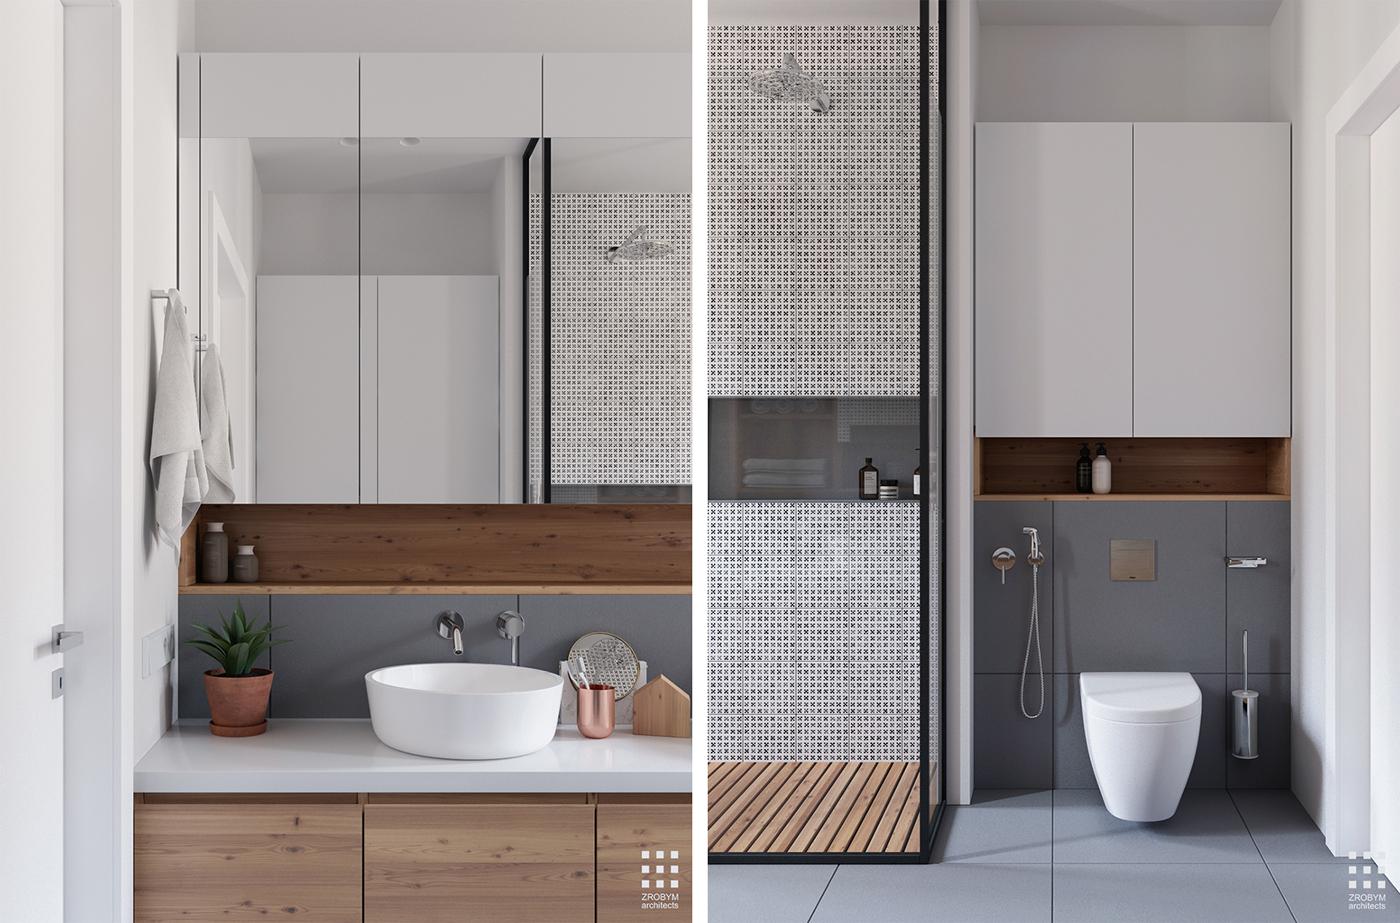 3d ontwerpen moderne badkamer door zrobym architects for 3d badkamer maken